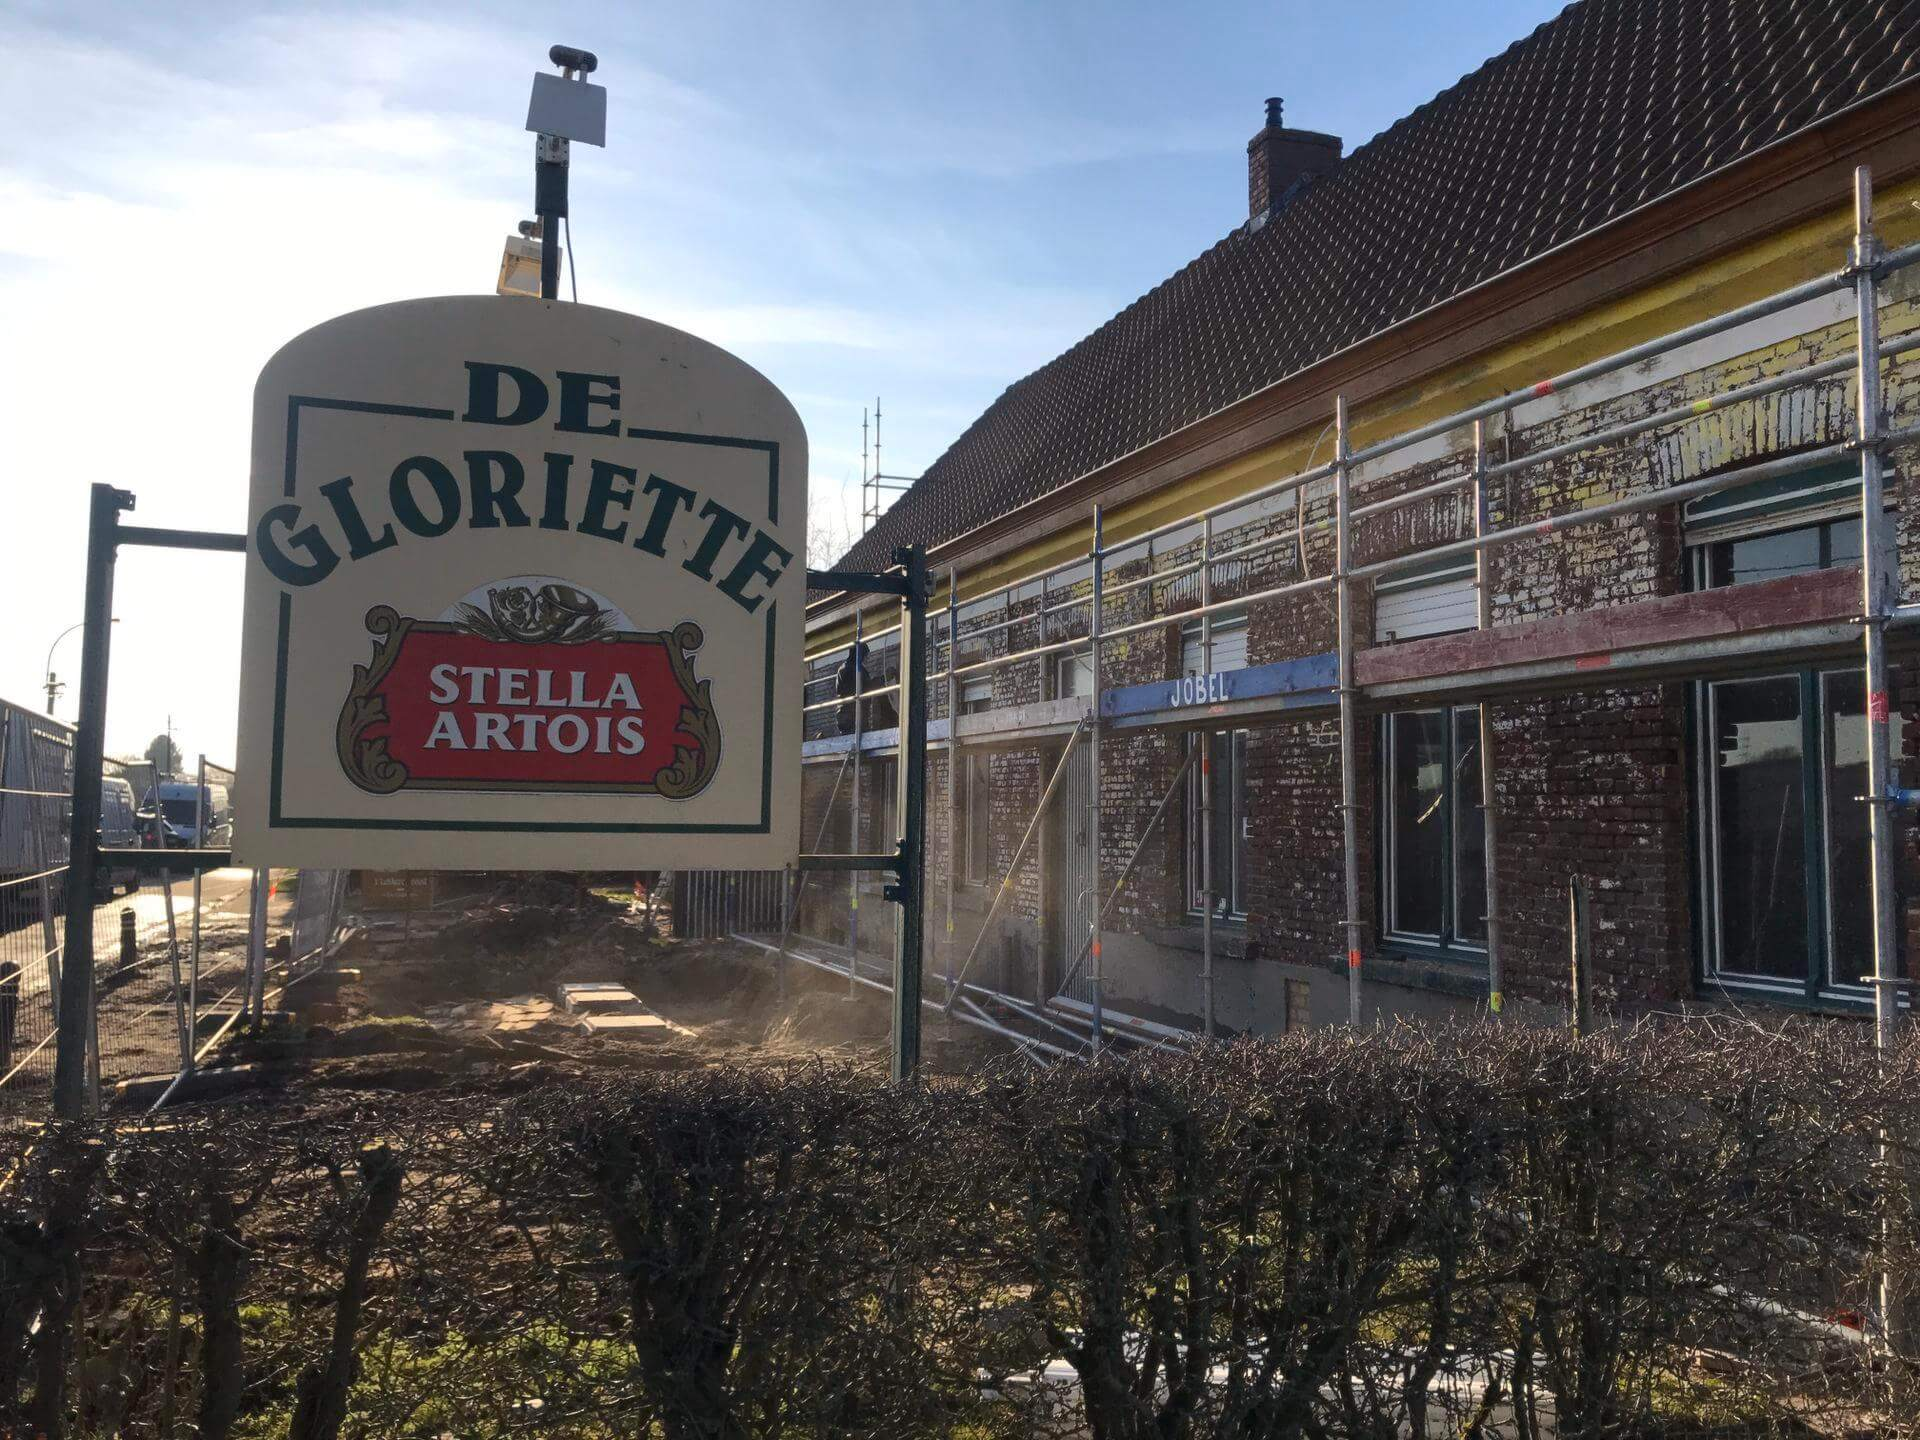 Gloriette case study opening